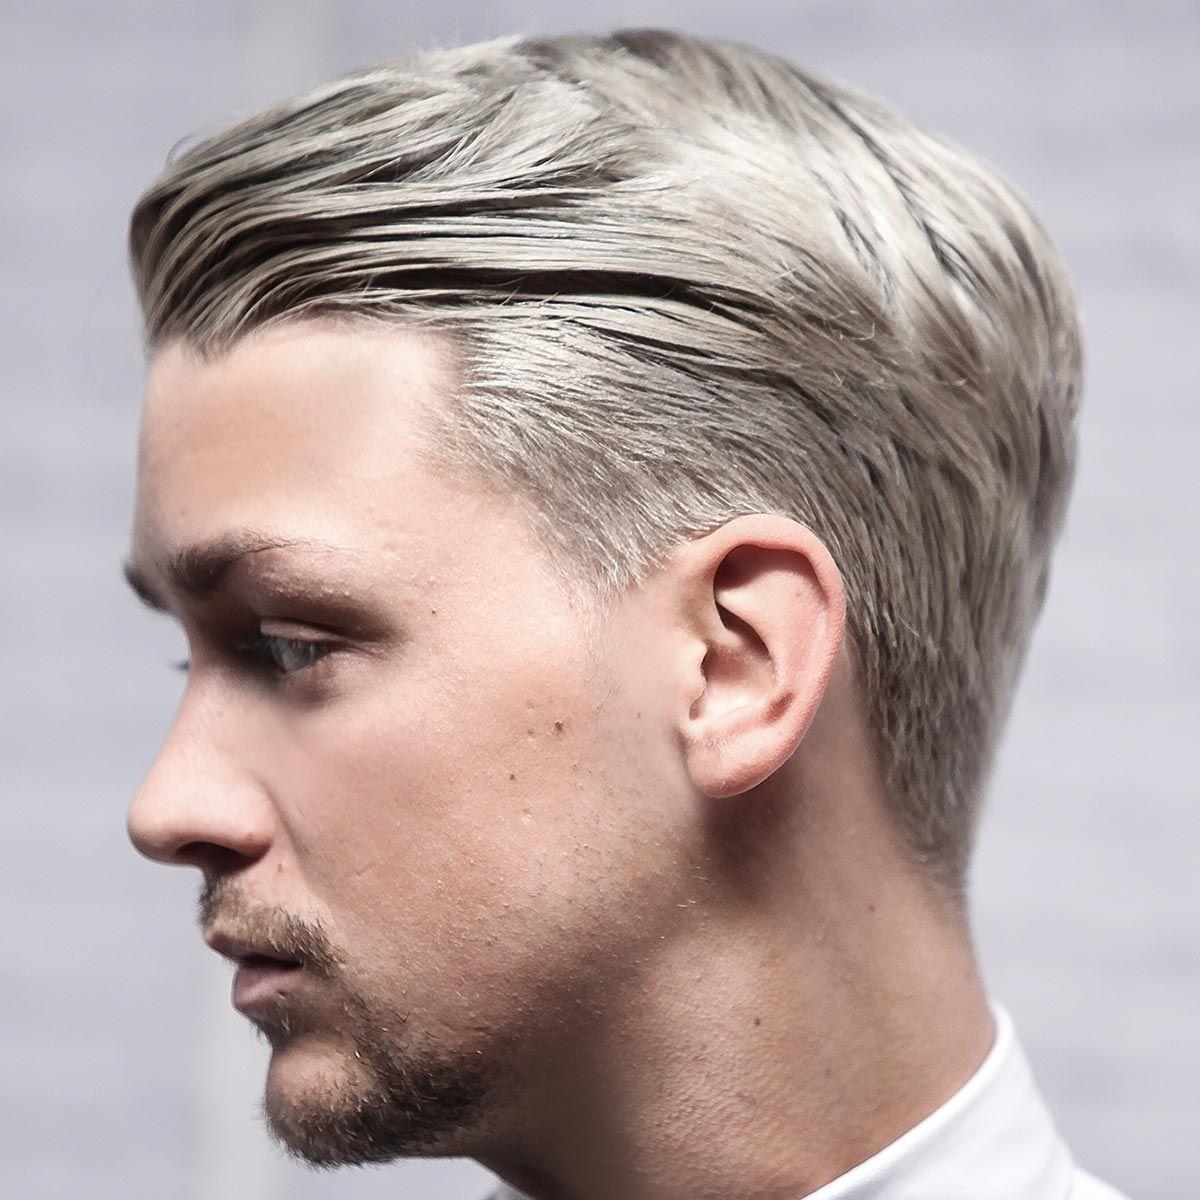 Haare männer dunkelblonde Trend